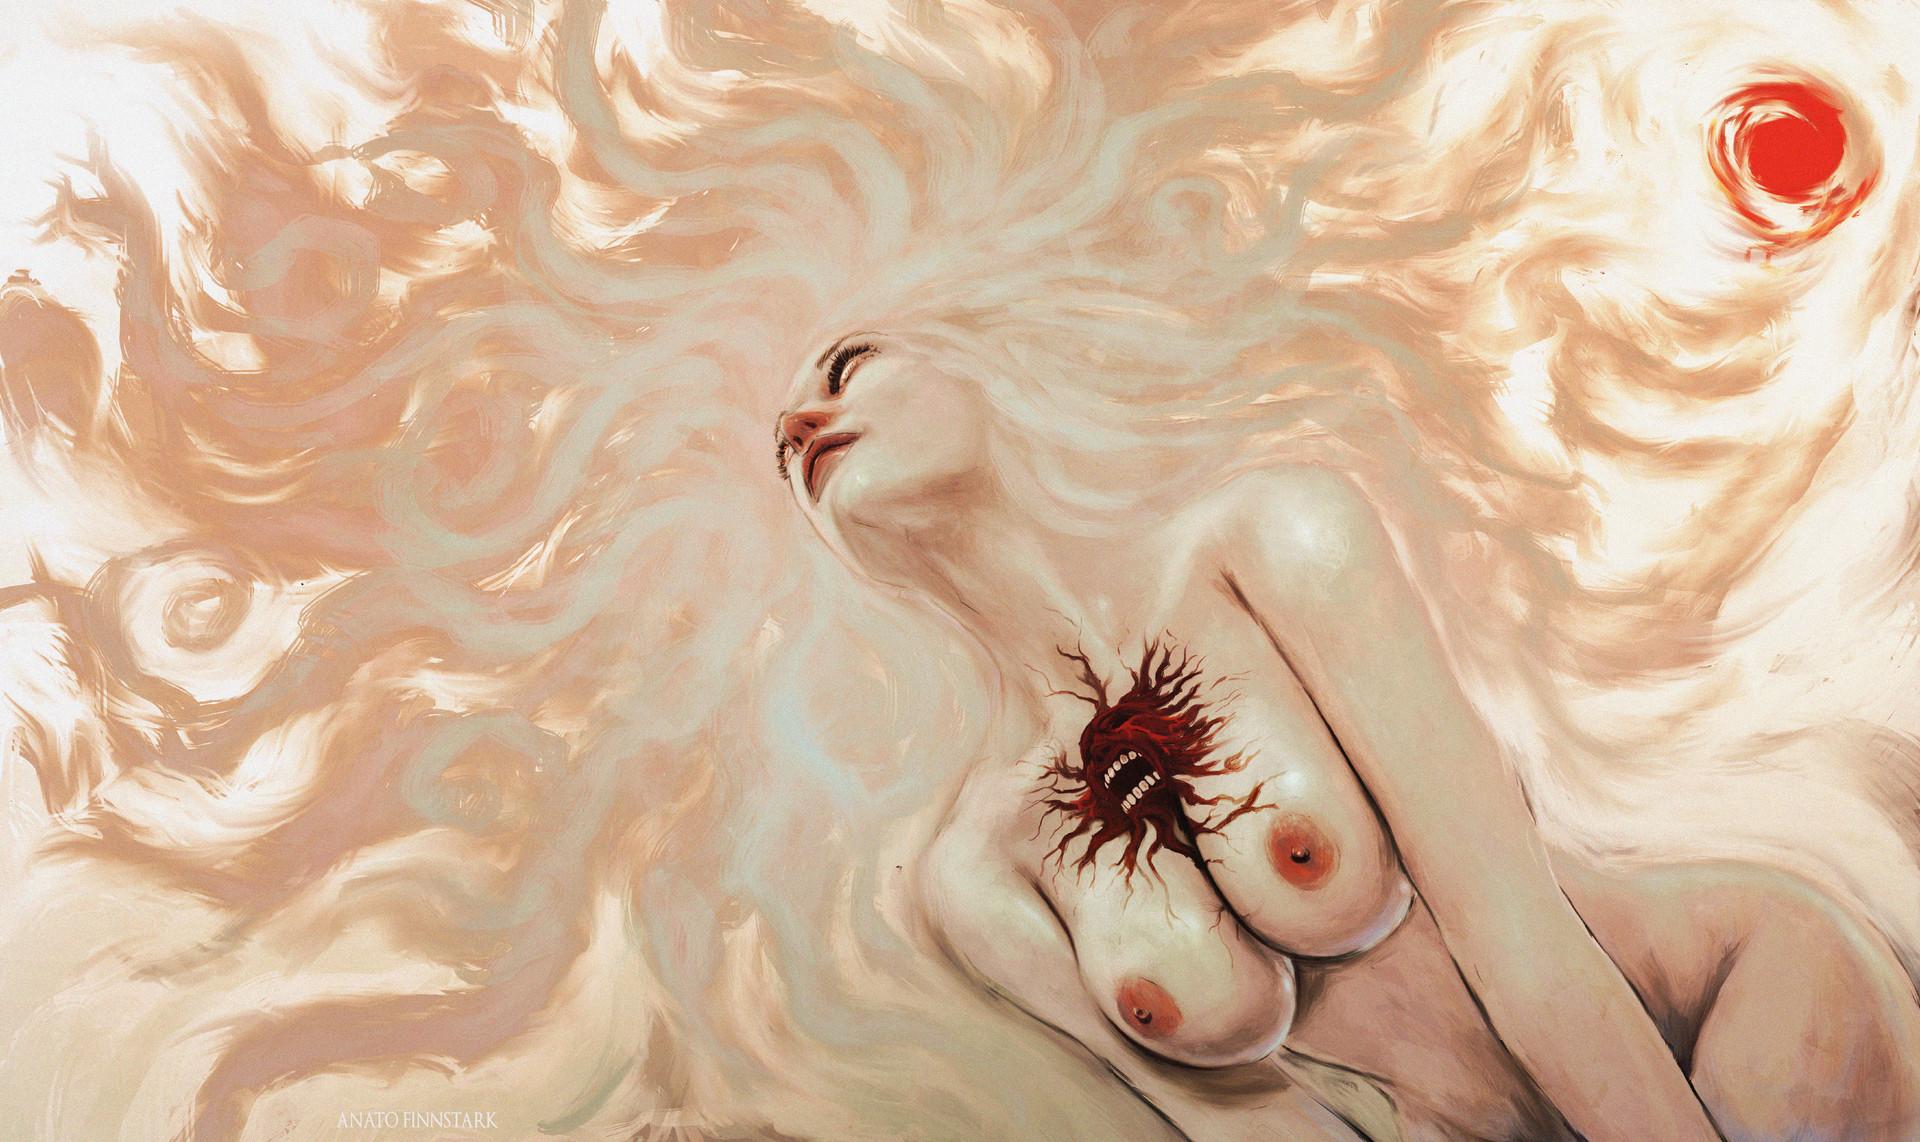 Anato finnstark slan the goddess of flame by anatofinnstark dcsr57j